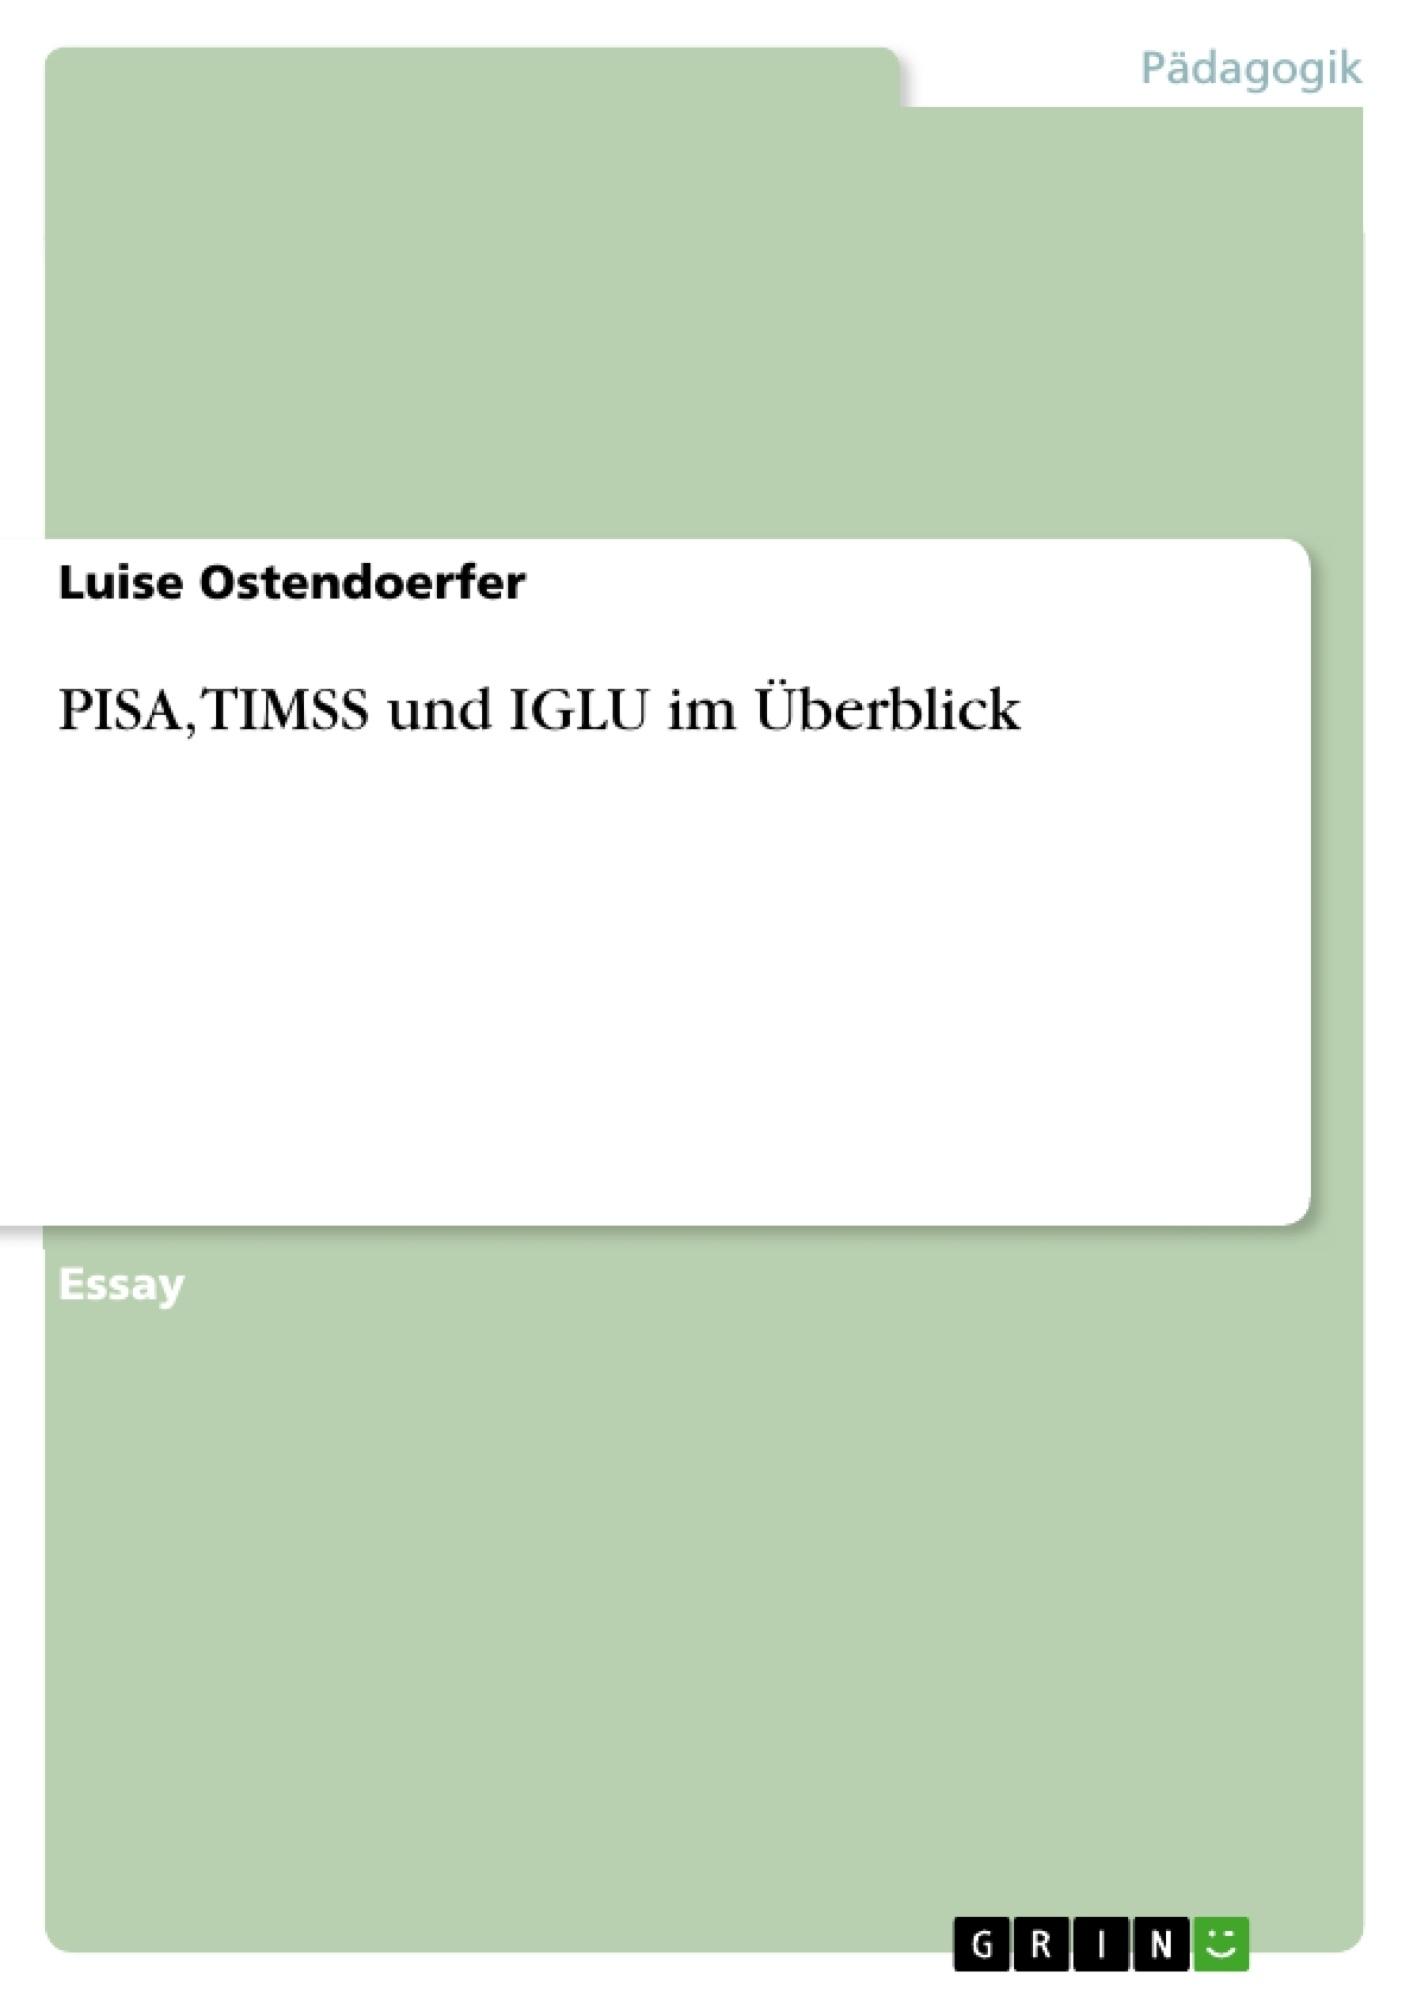 Titel: PISA, TIMSS und IGLU im Überblick